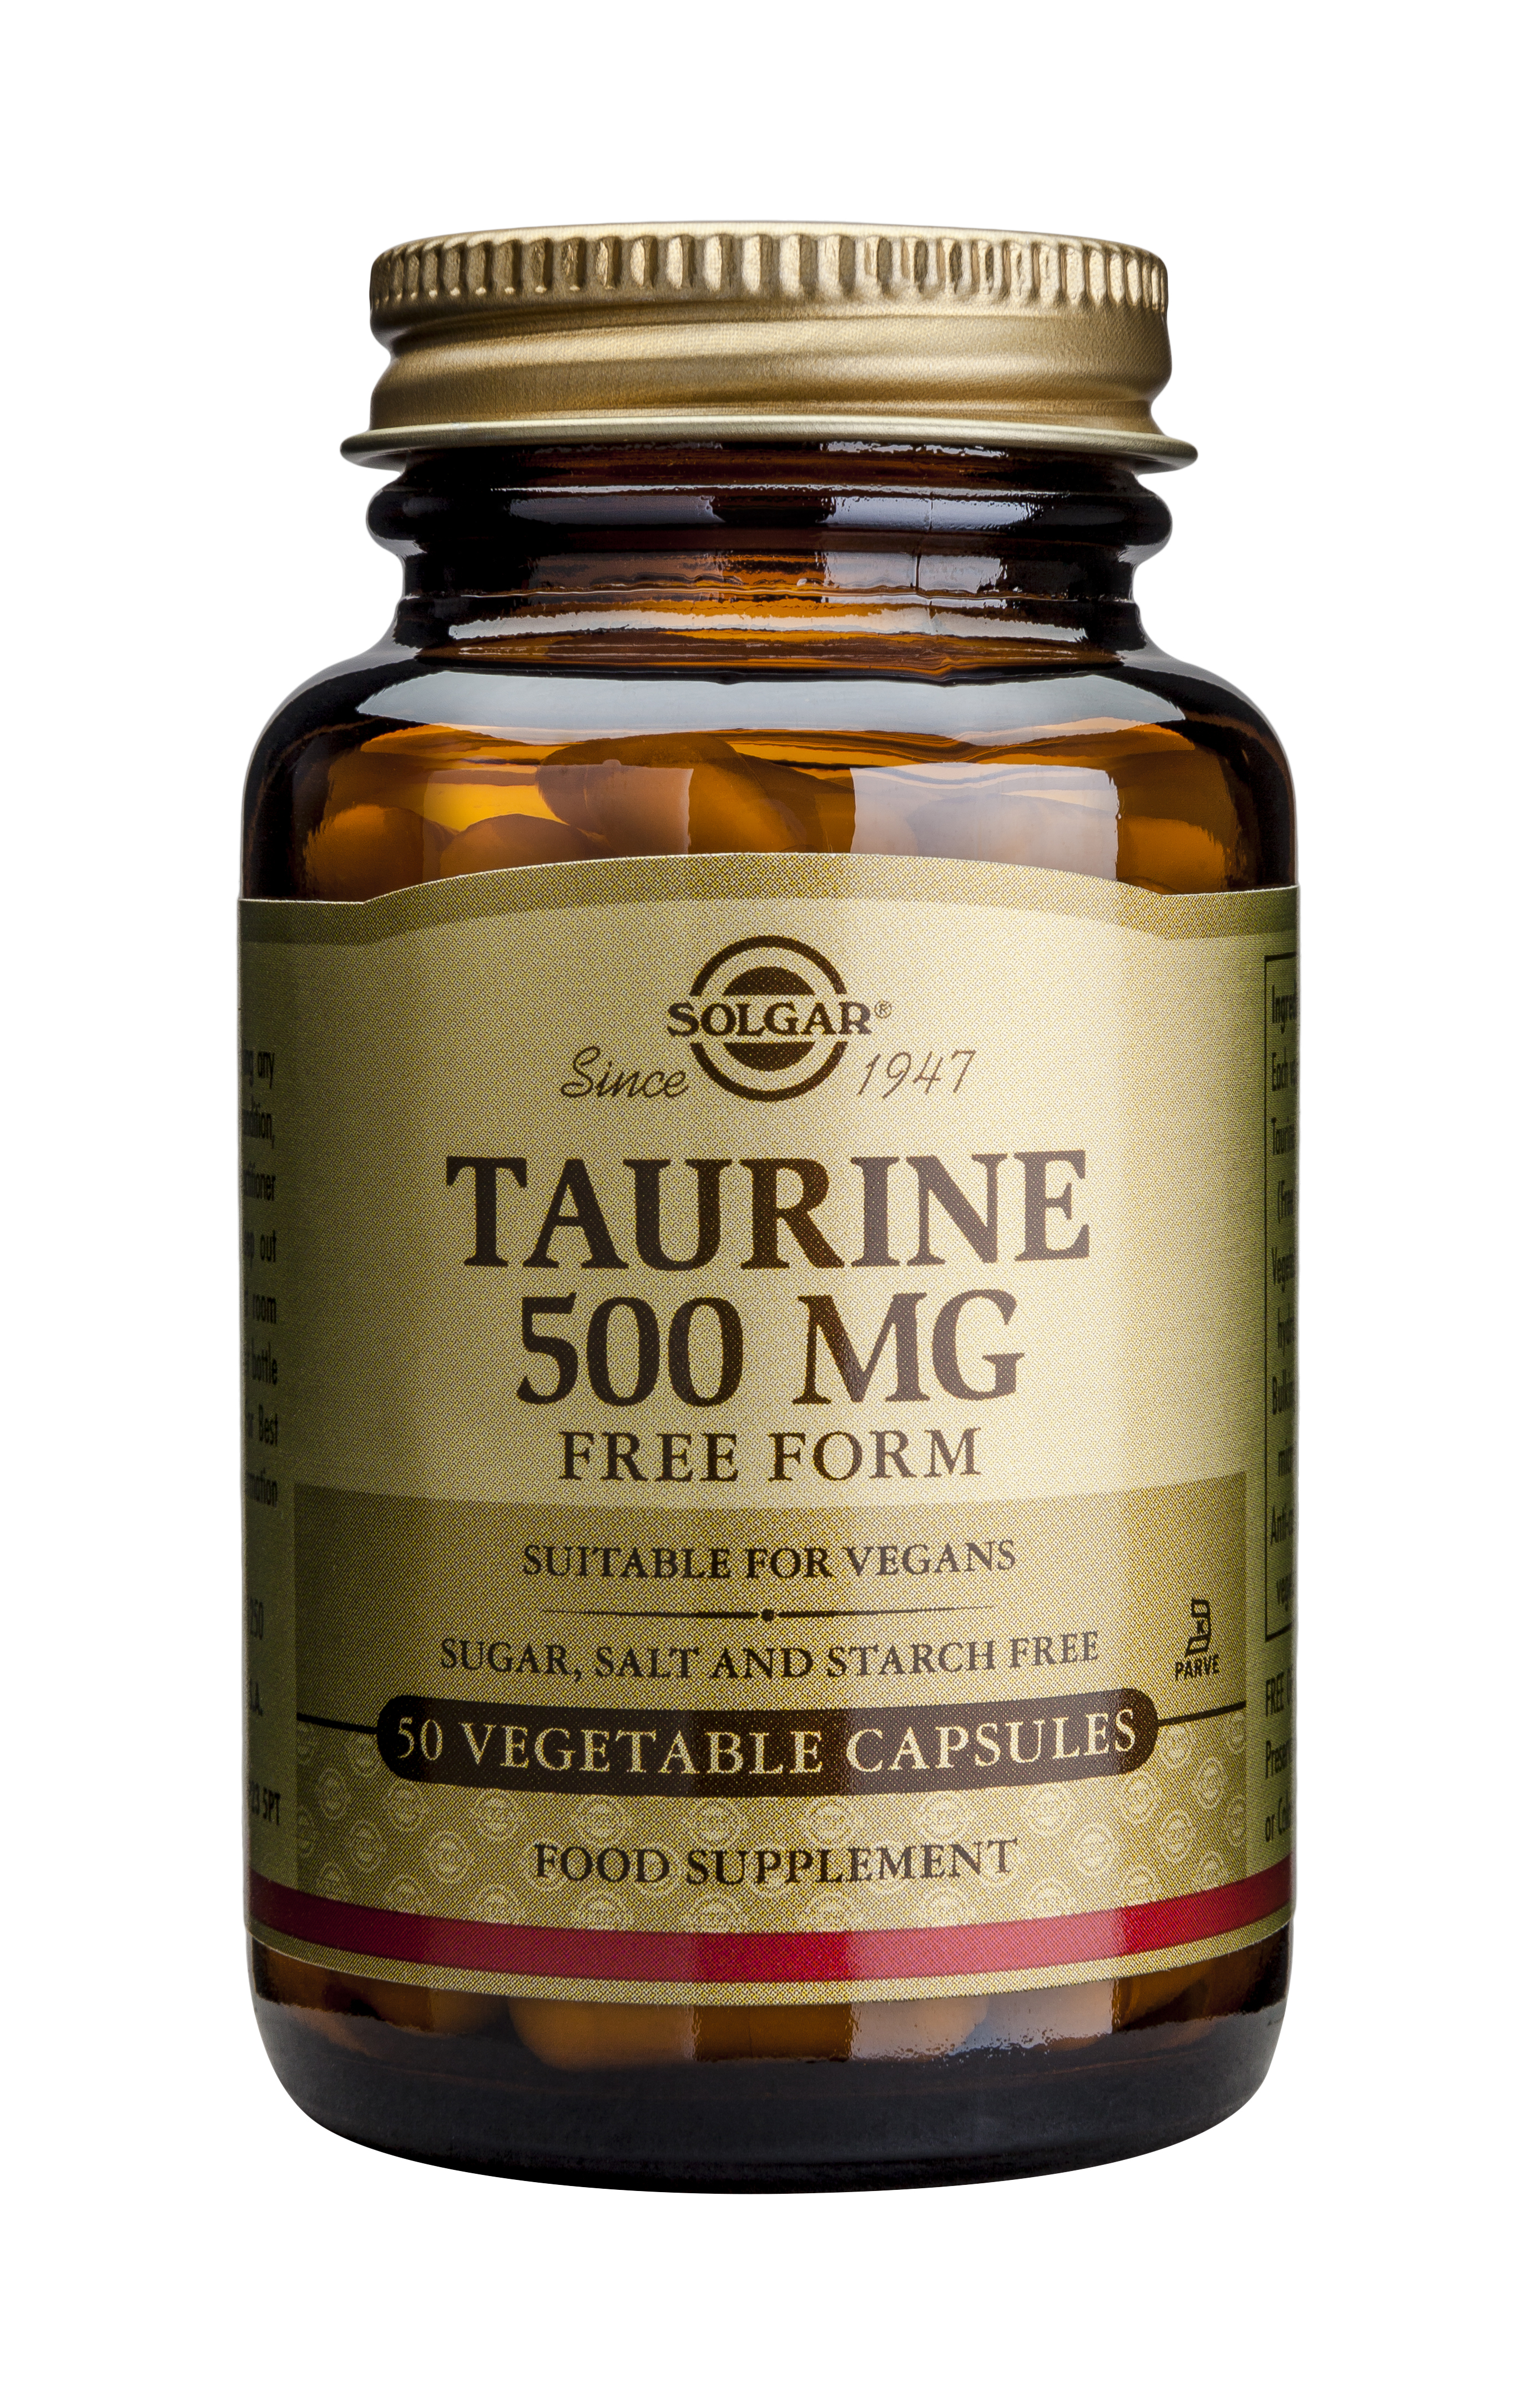 Taurine 500mg 50 veg caps